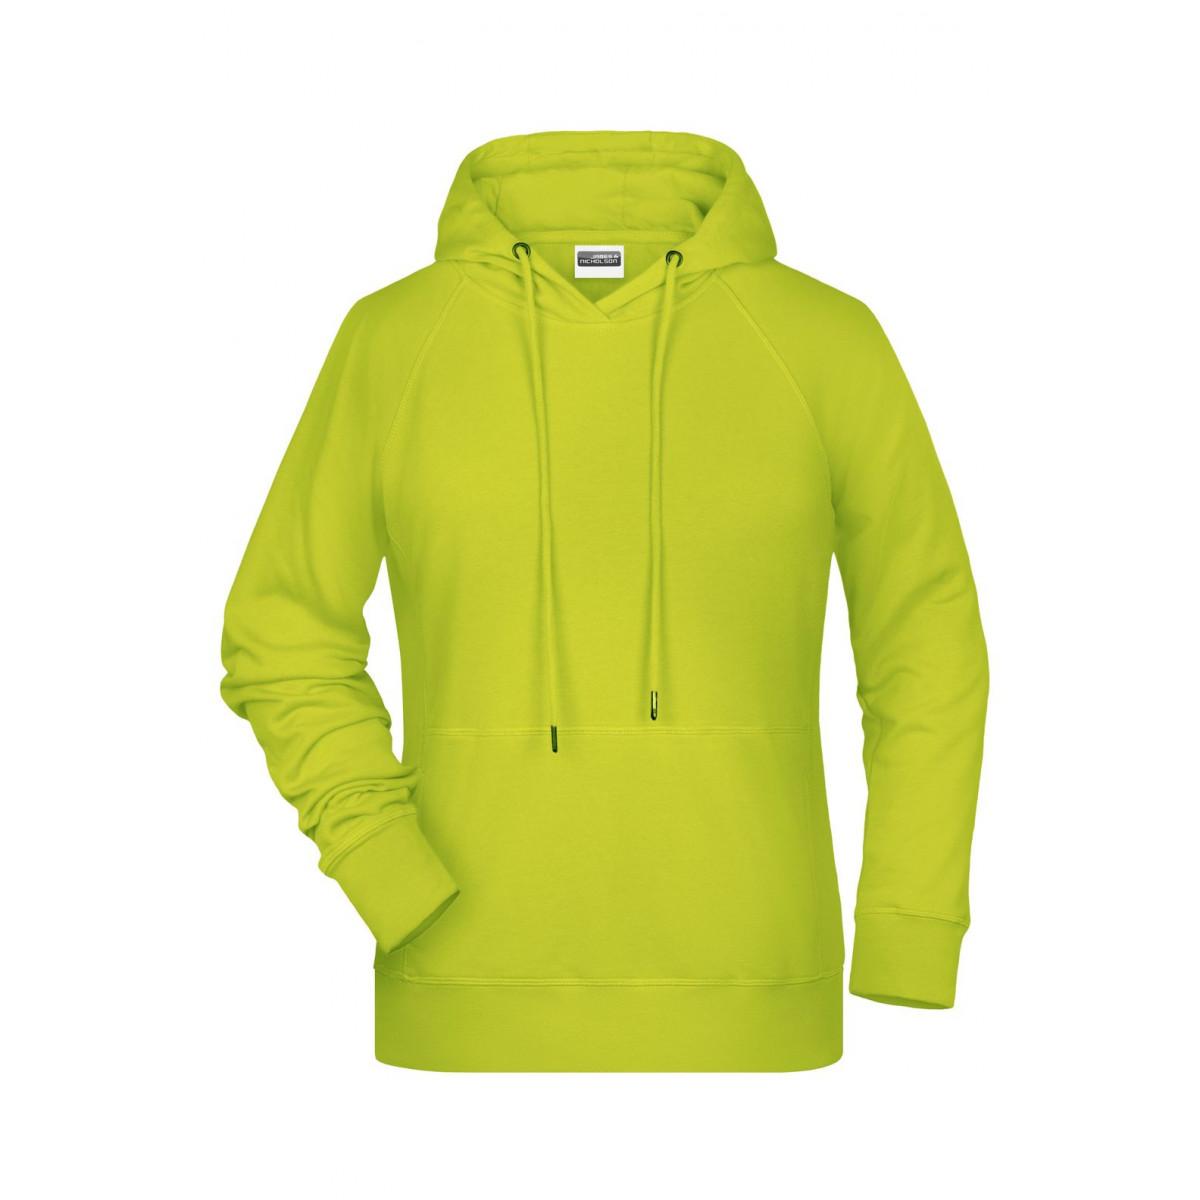 Толстовка женская 8023 Ladies Hoody - Ярко-желтый